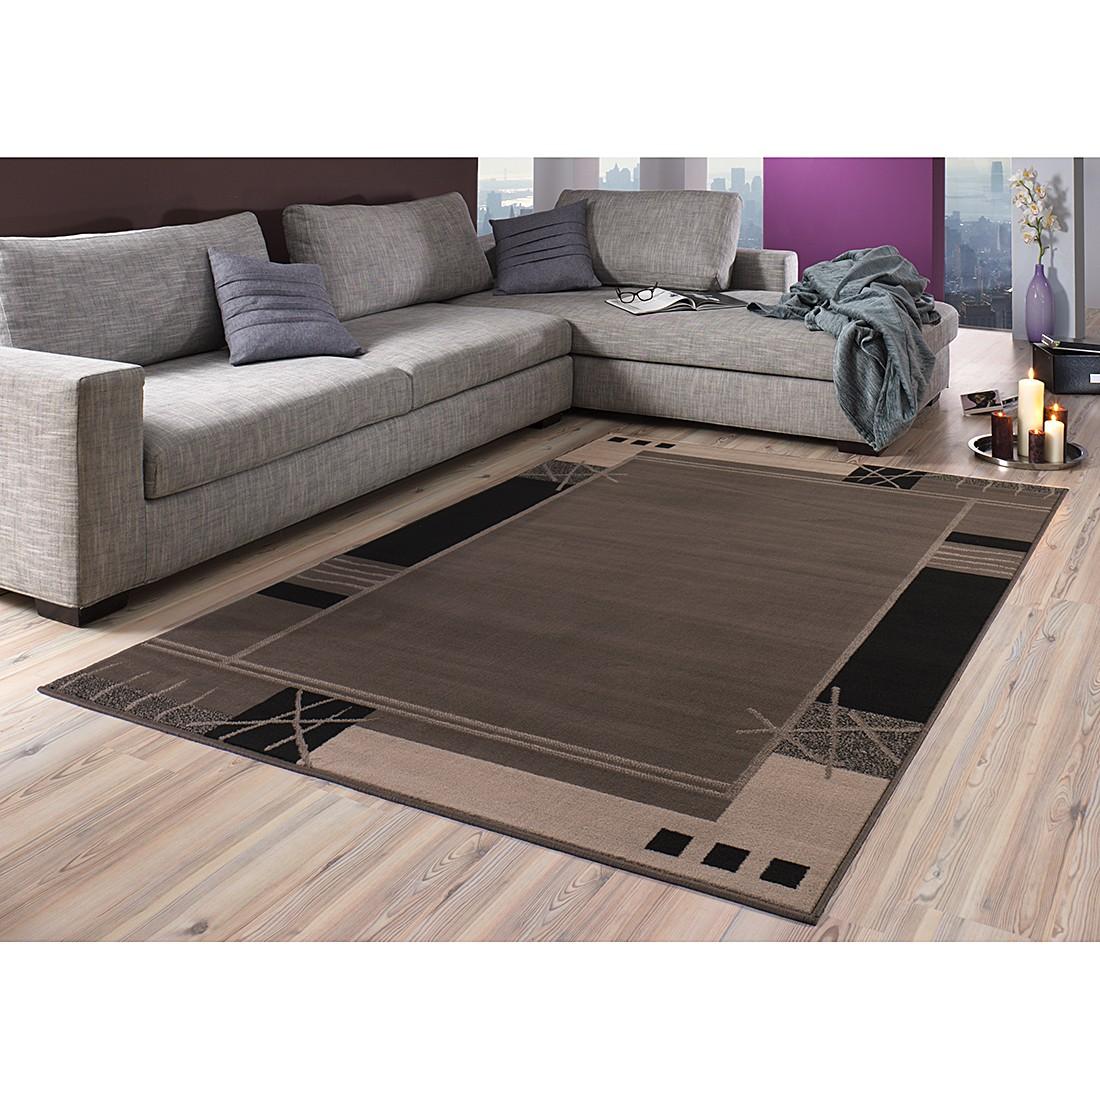 Teppich Prime Pile – Grau – 120 cm x 170 cm, Hanse Home Collection kaufen